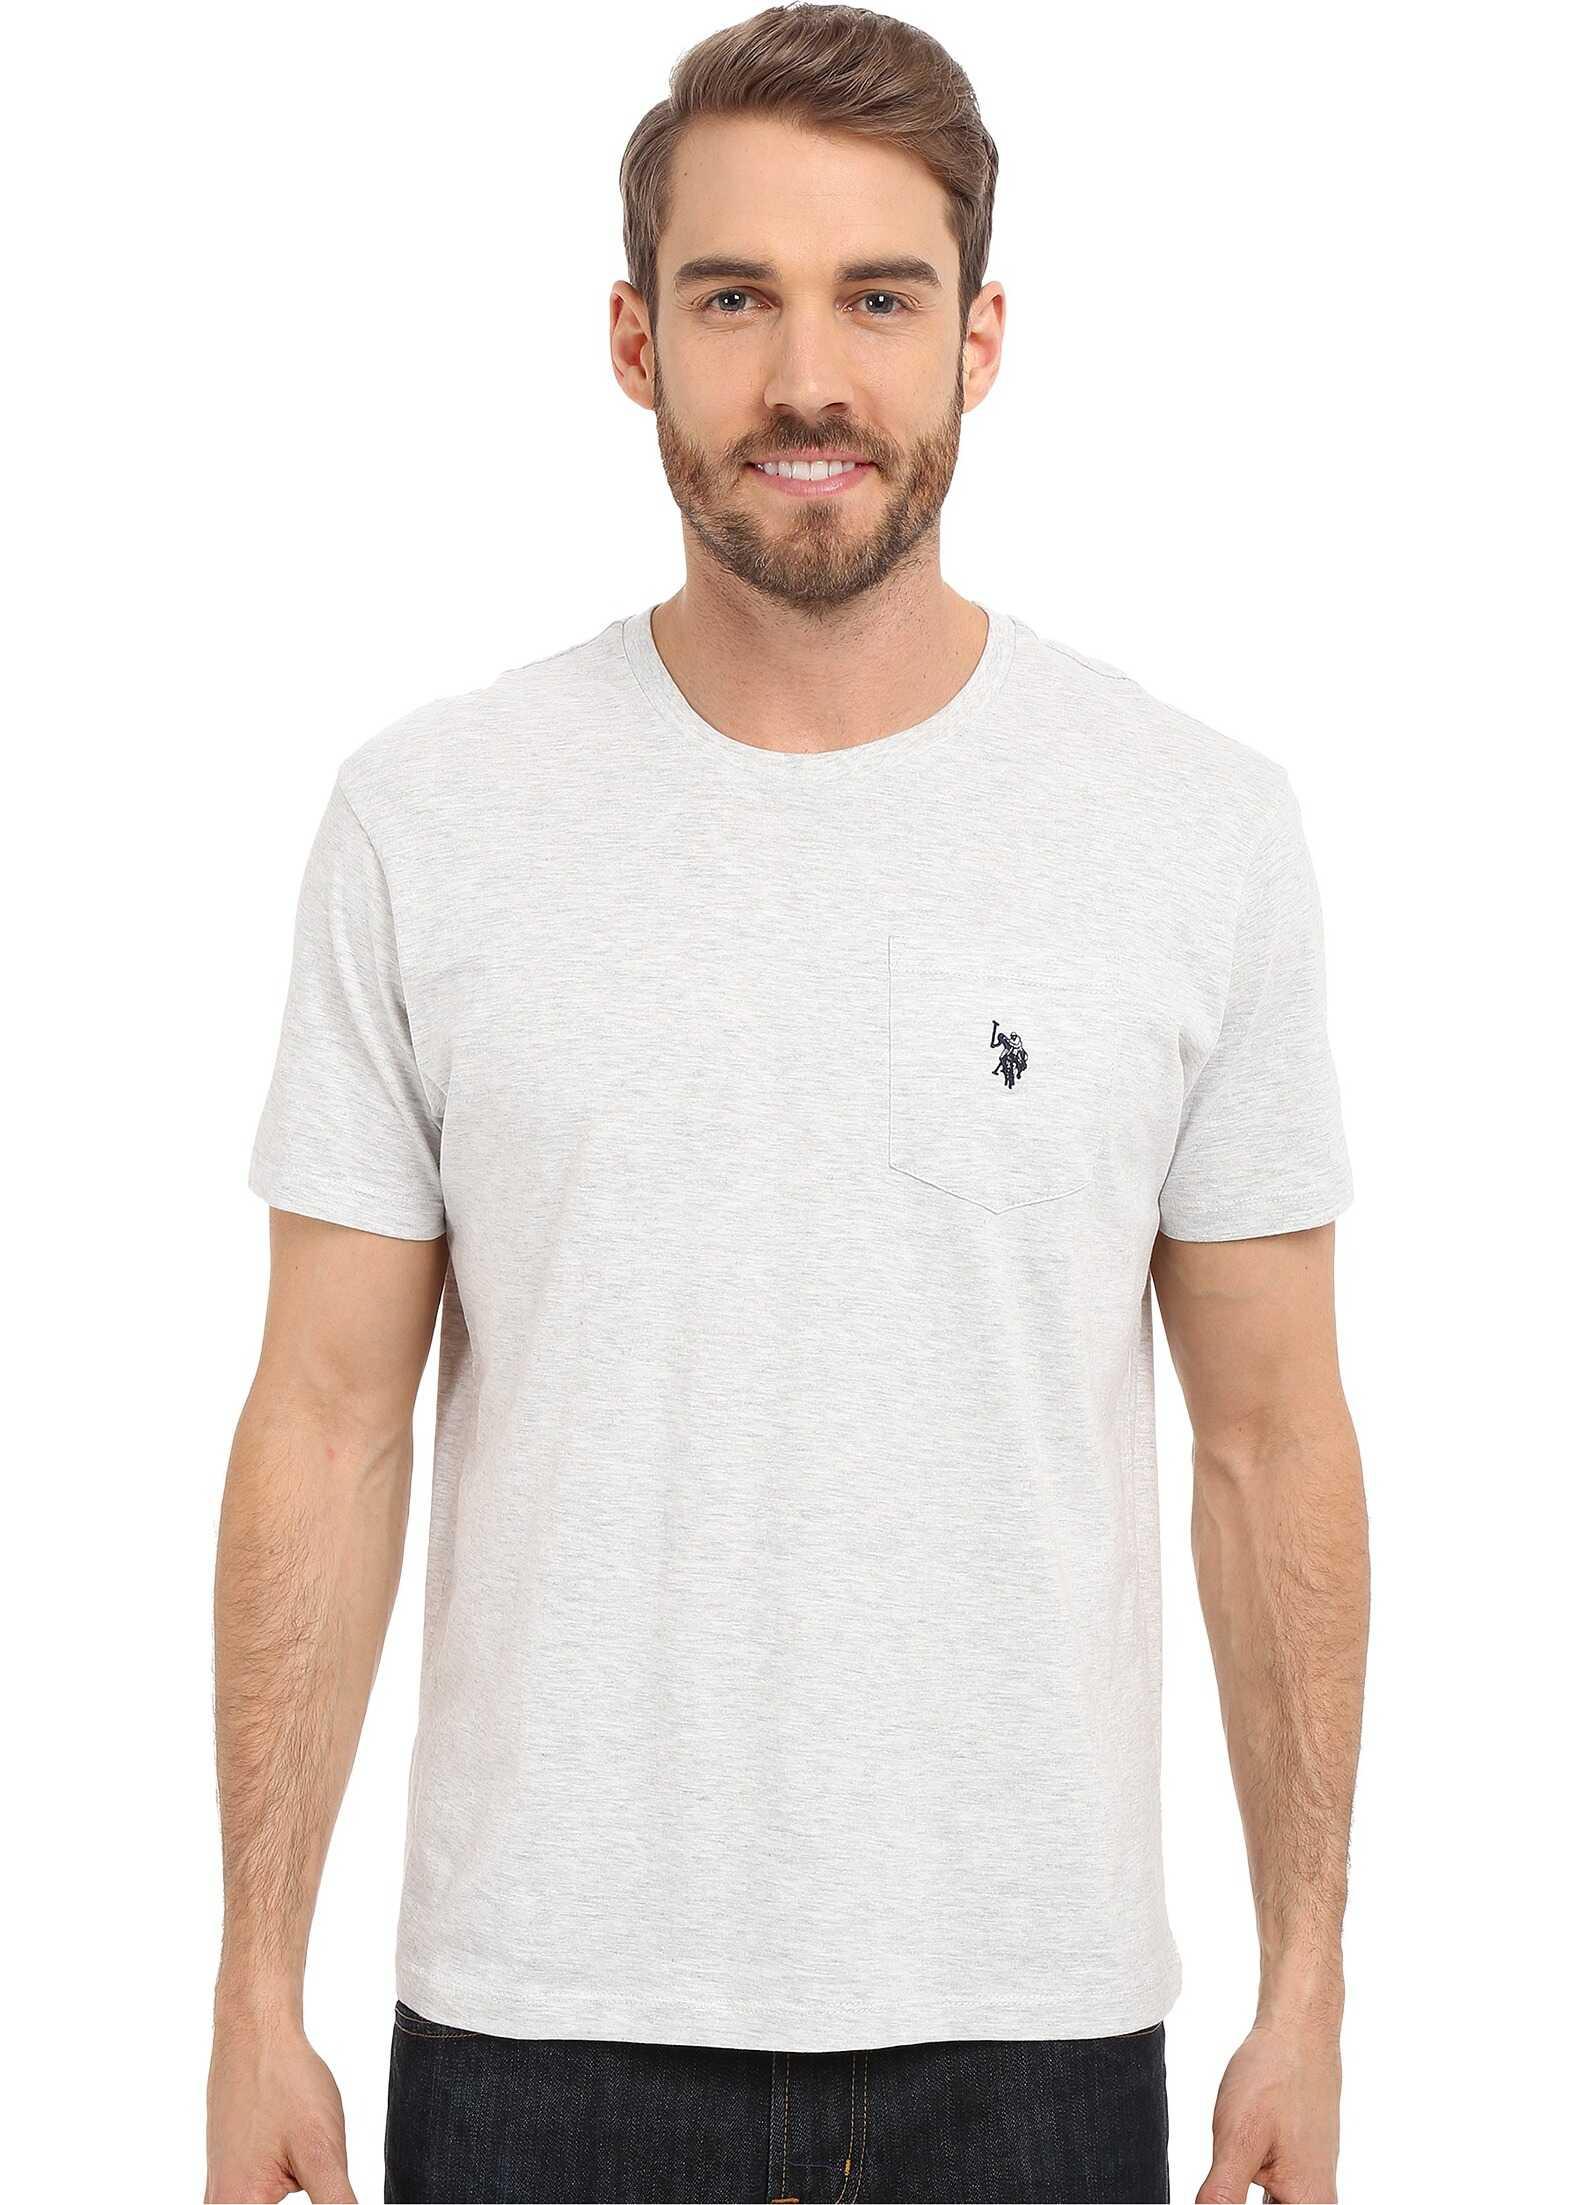 Solid Crew Neck Pocket T-Shirt